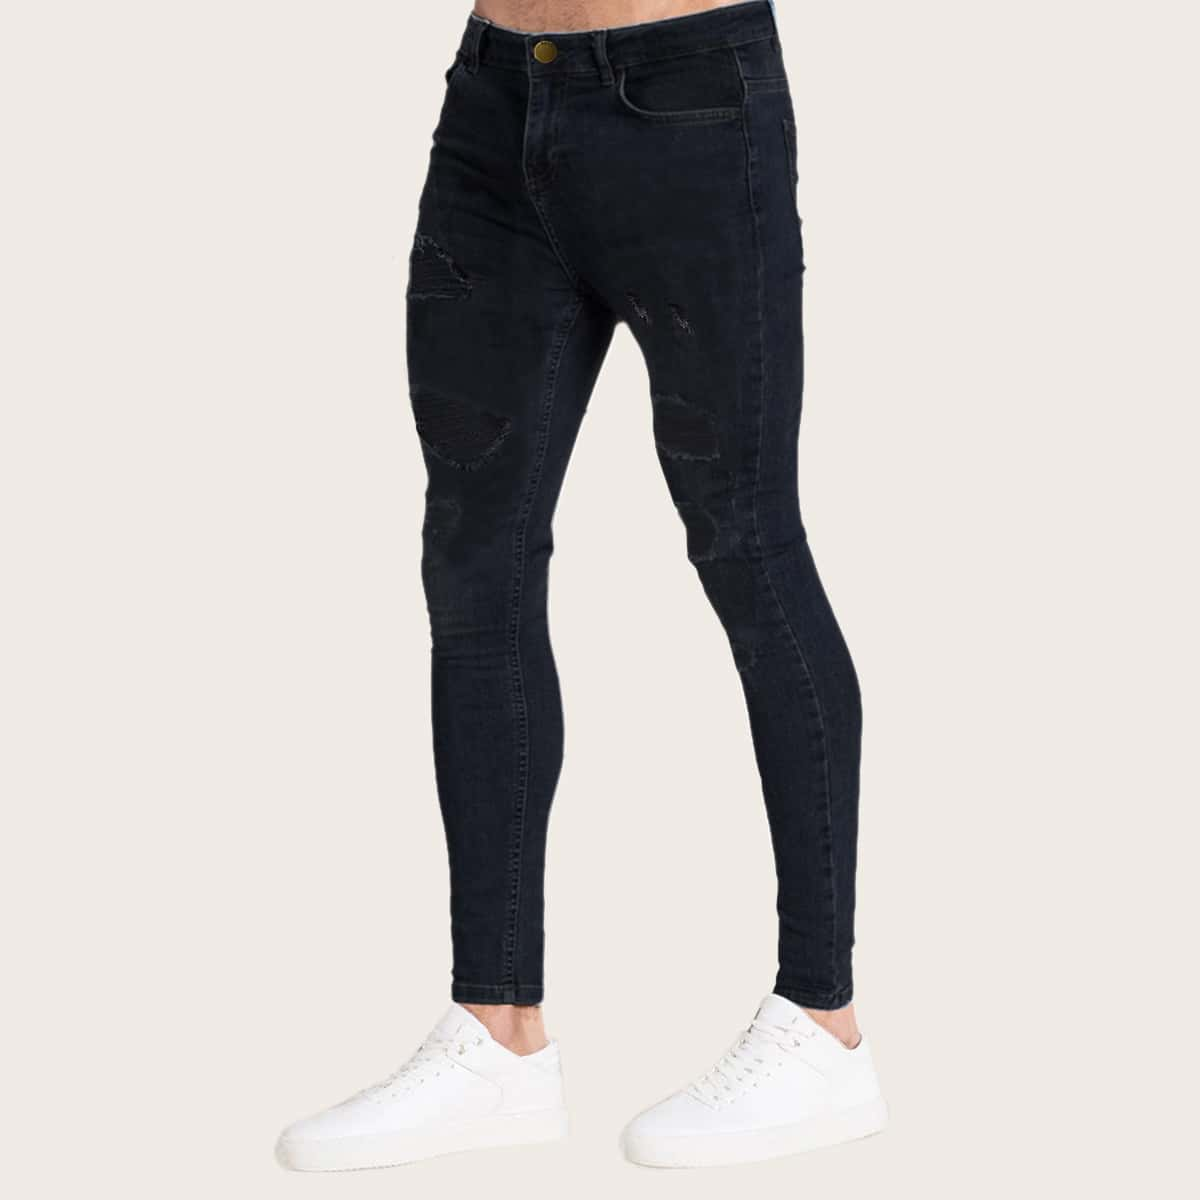 Zwart Casual Vlak Heren Jeans Gescheurd